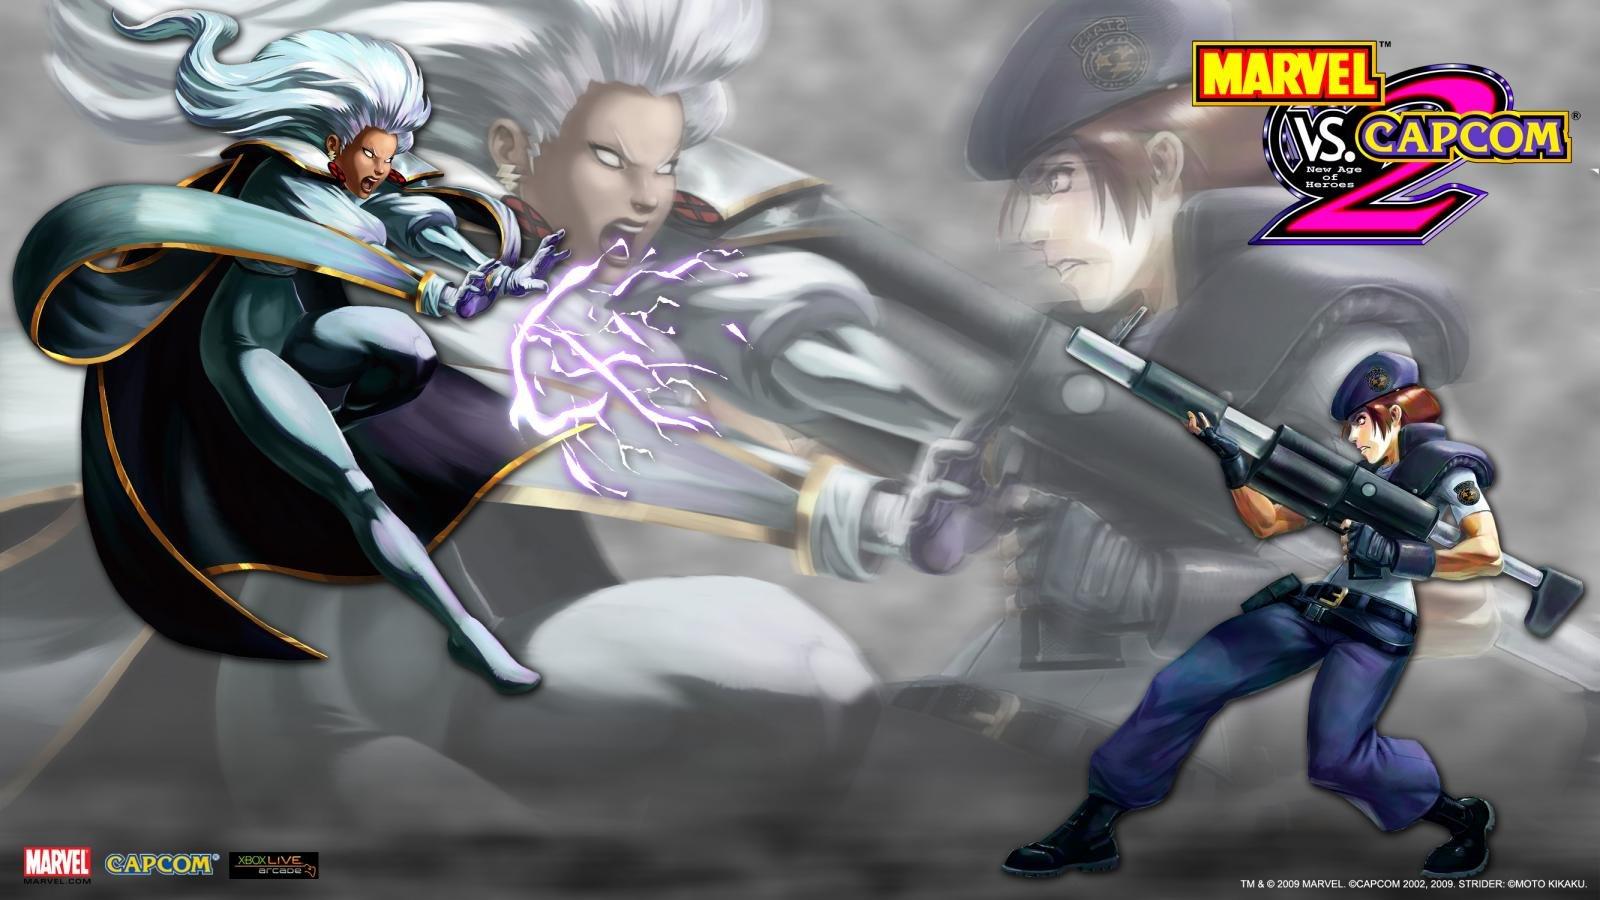 Download Hd 1600x900 Marvel Vs Capcom 2 Pc Background Id 142338